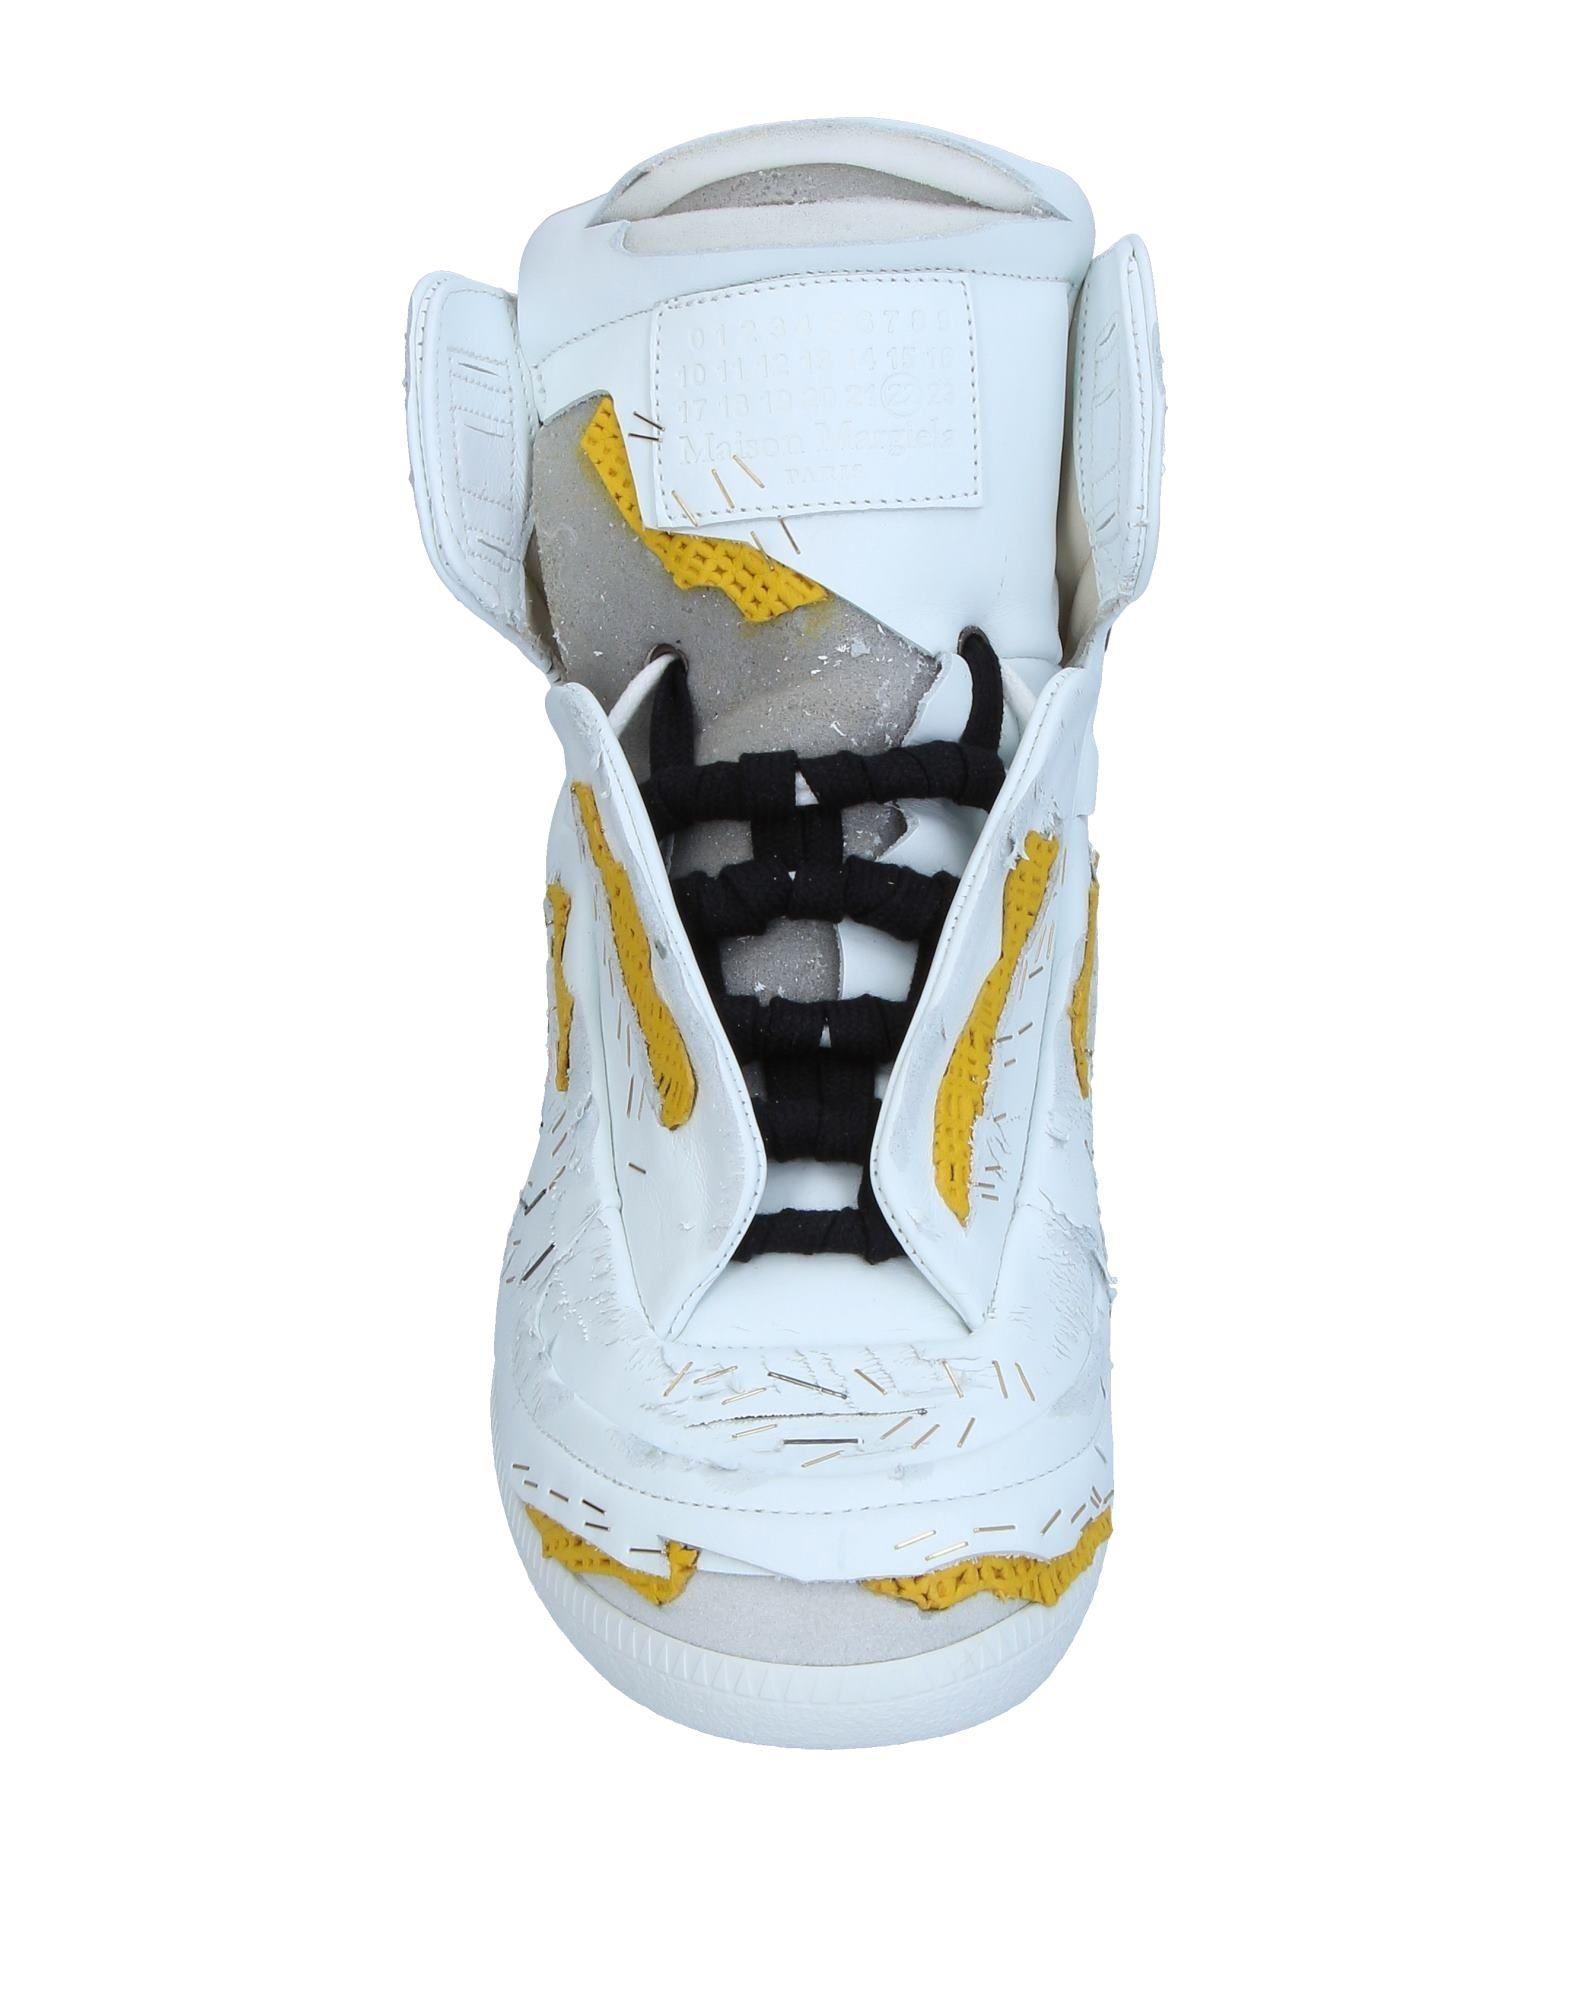 Maison Margiela Sneakers Herren beliebte  11352799EX Gute Qualität beliebte Herren Schuhe 30b726